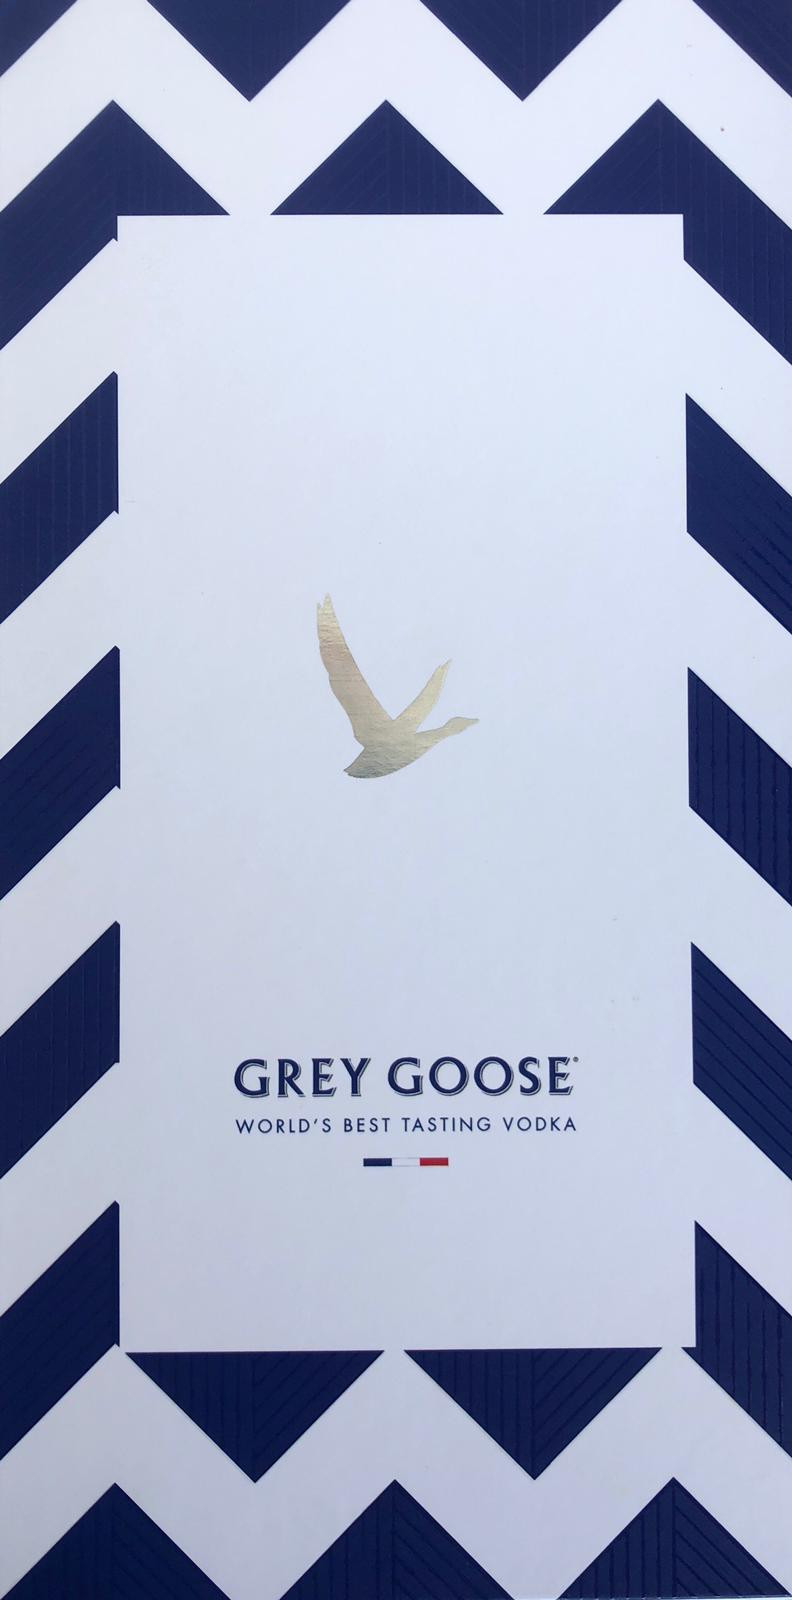 ÜberVida Mini Cruise sponsored by Grey Goose!